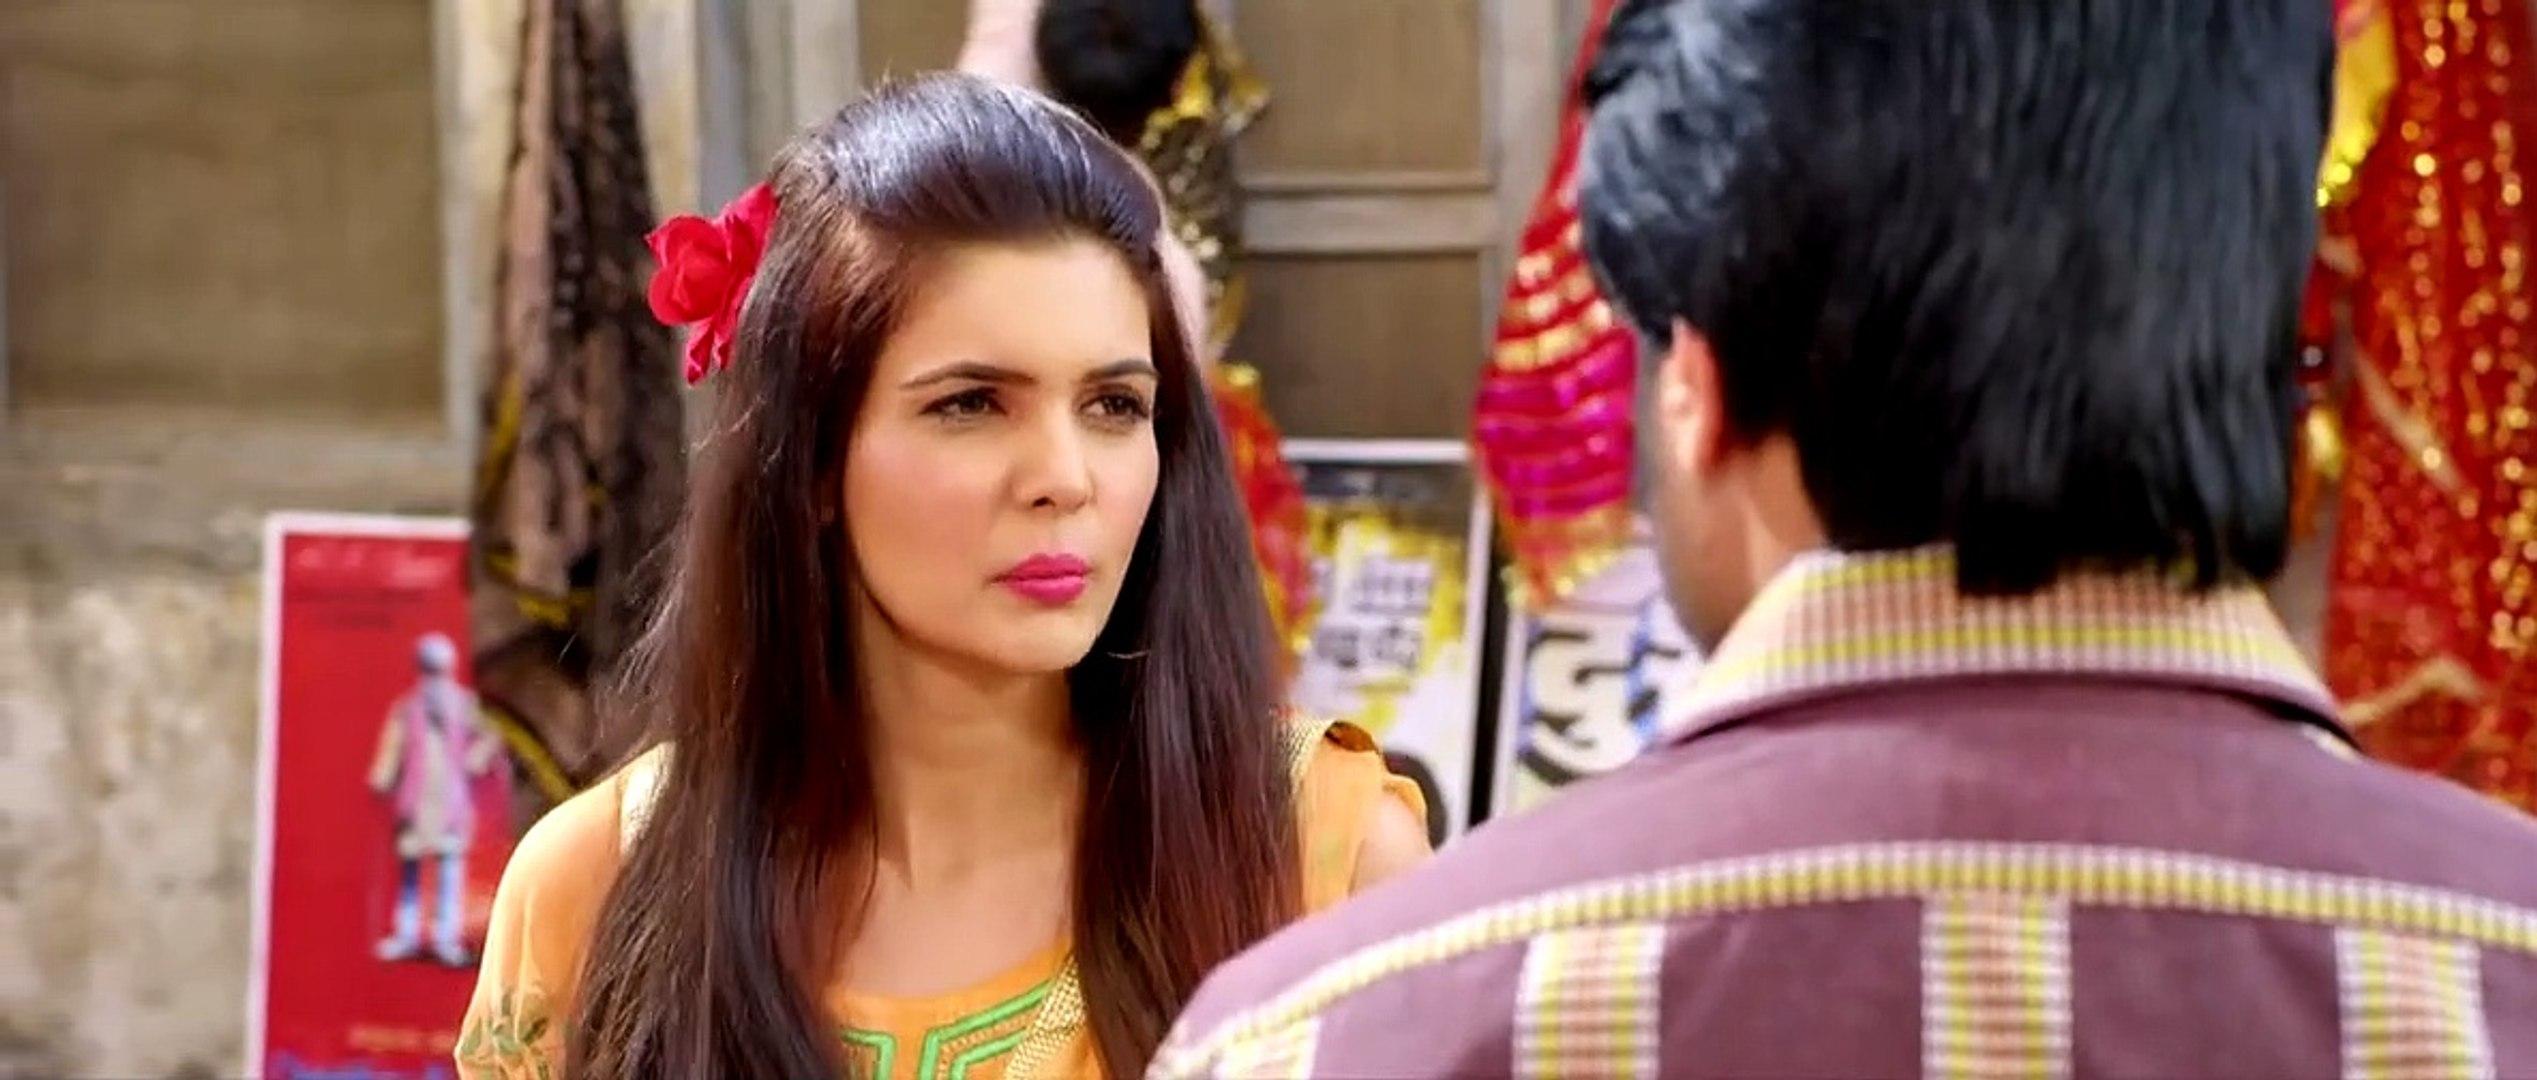 Blackia (2019) full Punjabi movie HD part 2 - 3